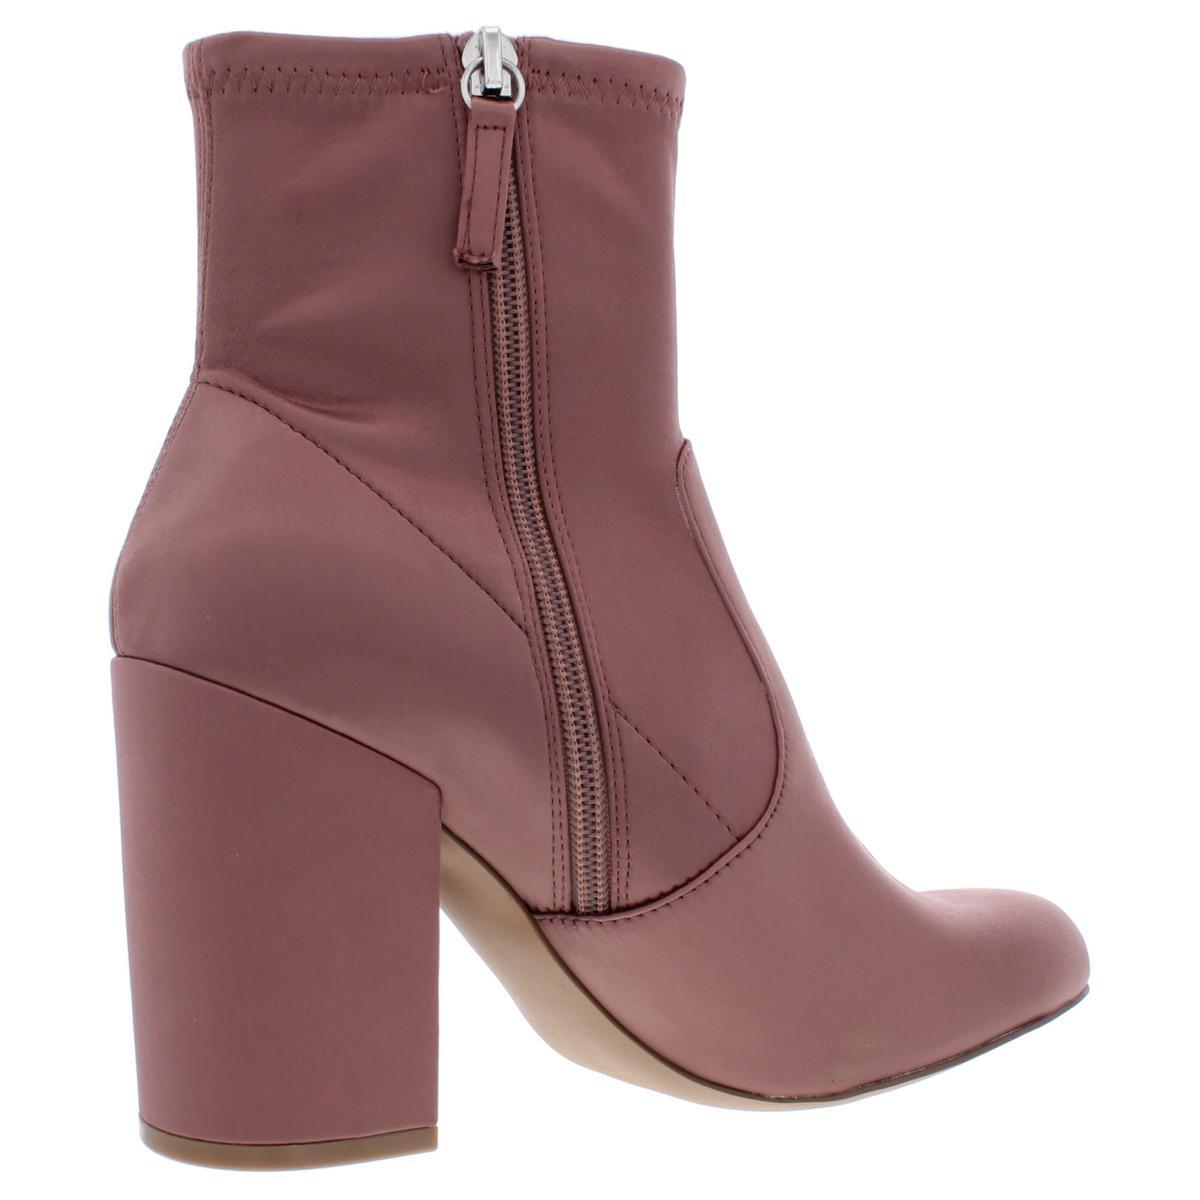 BHFO 5052 Aerosoles Womens PAPYRUS Taupe Combat Boots Shoes 9.5 Medium B,M